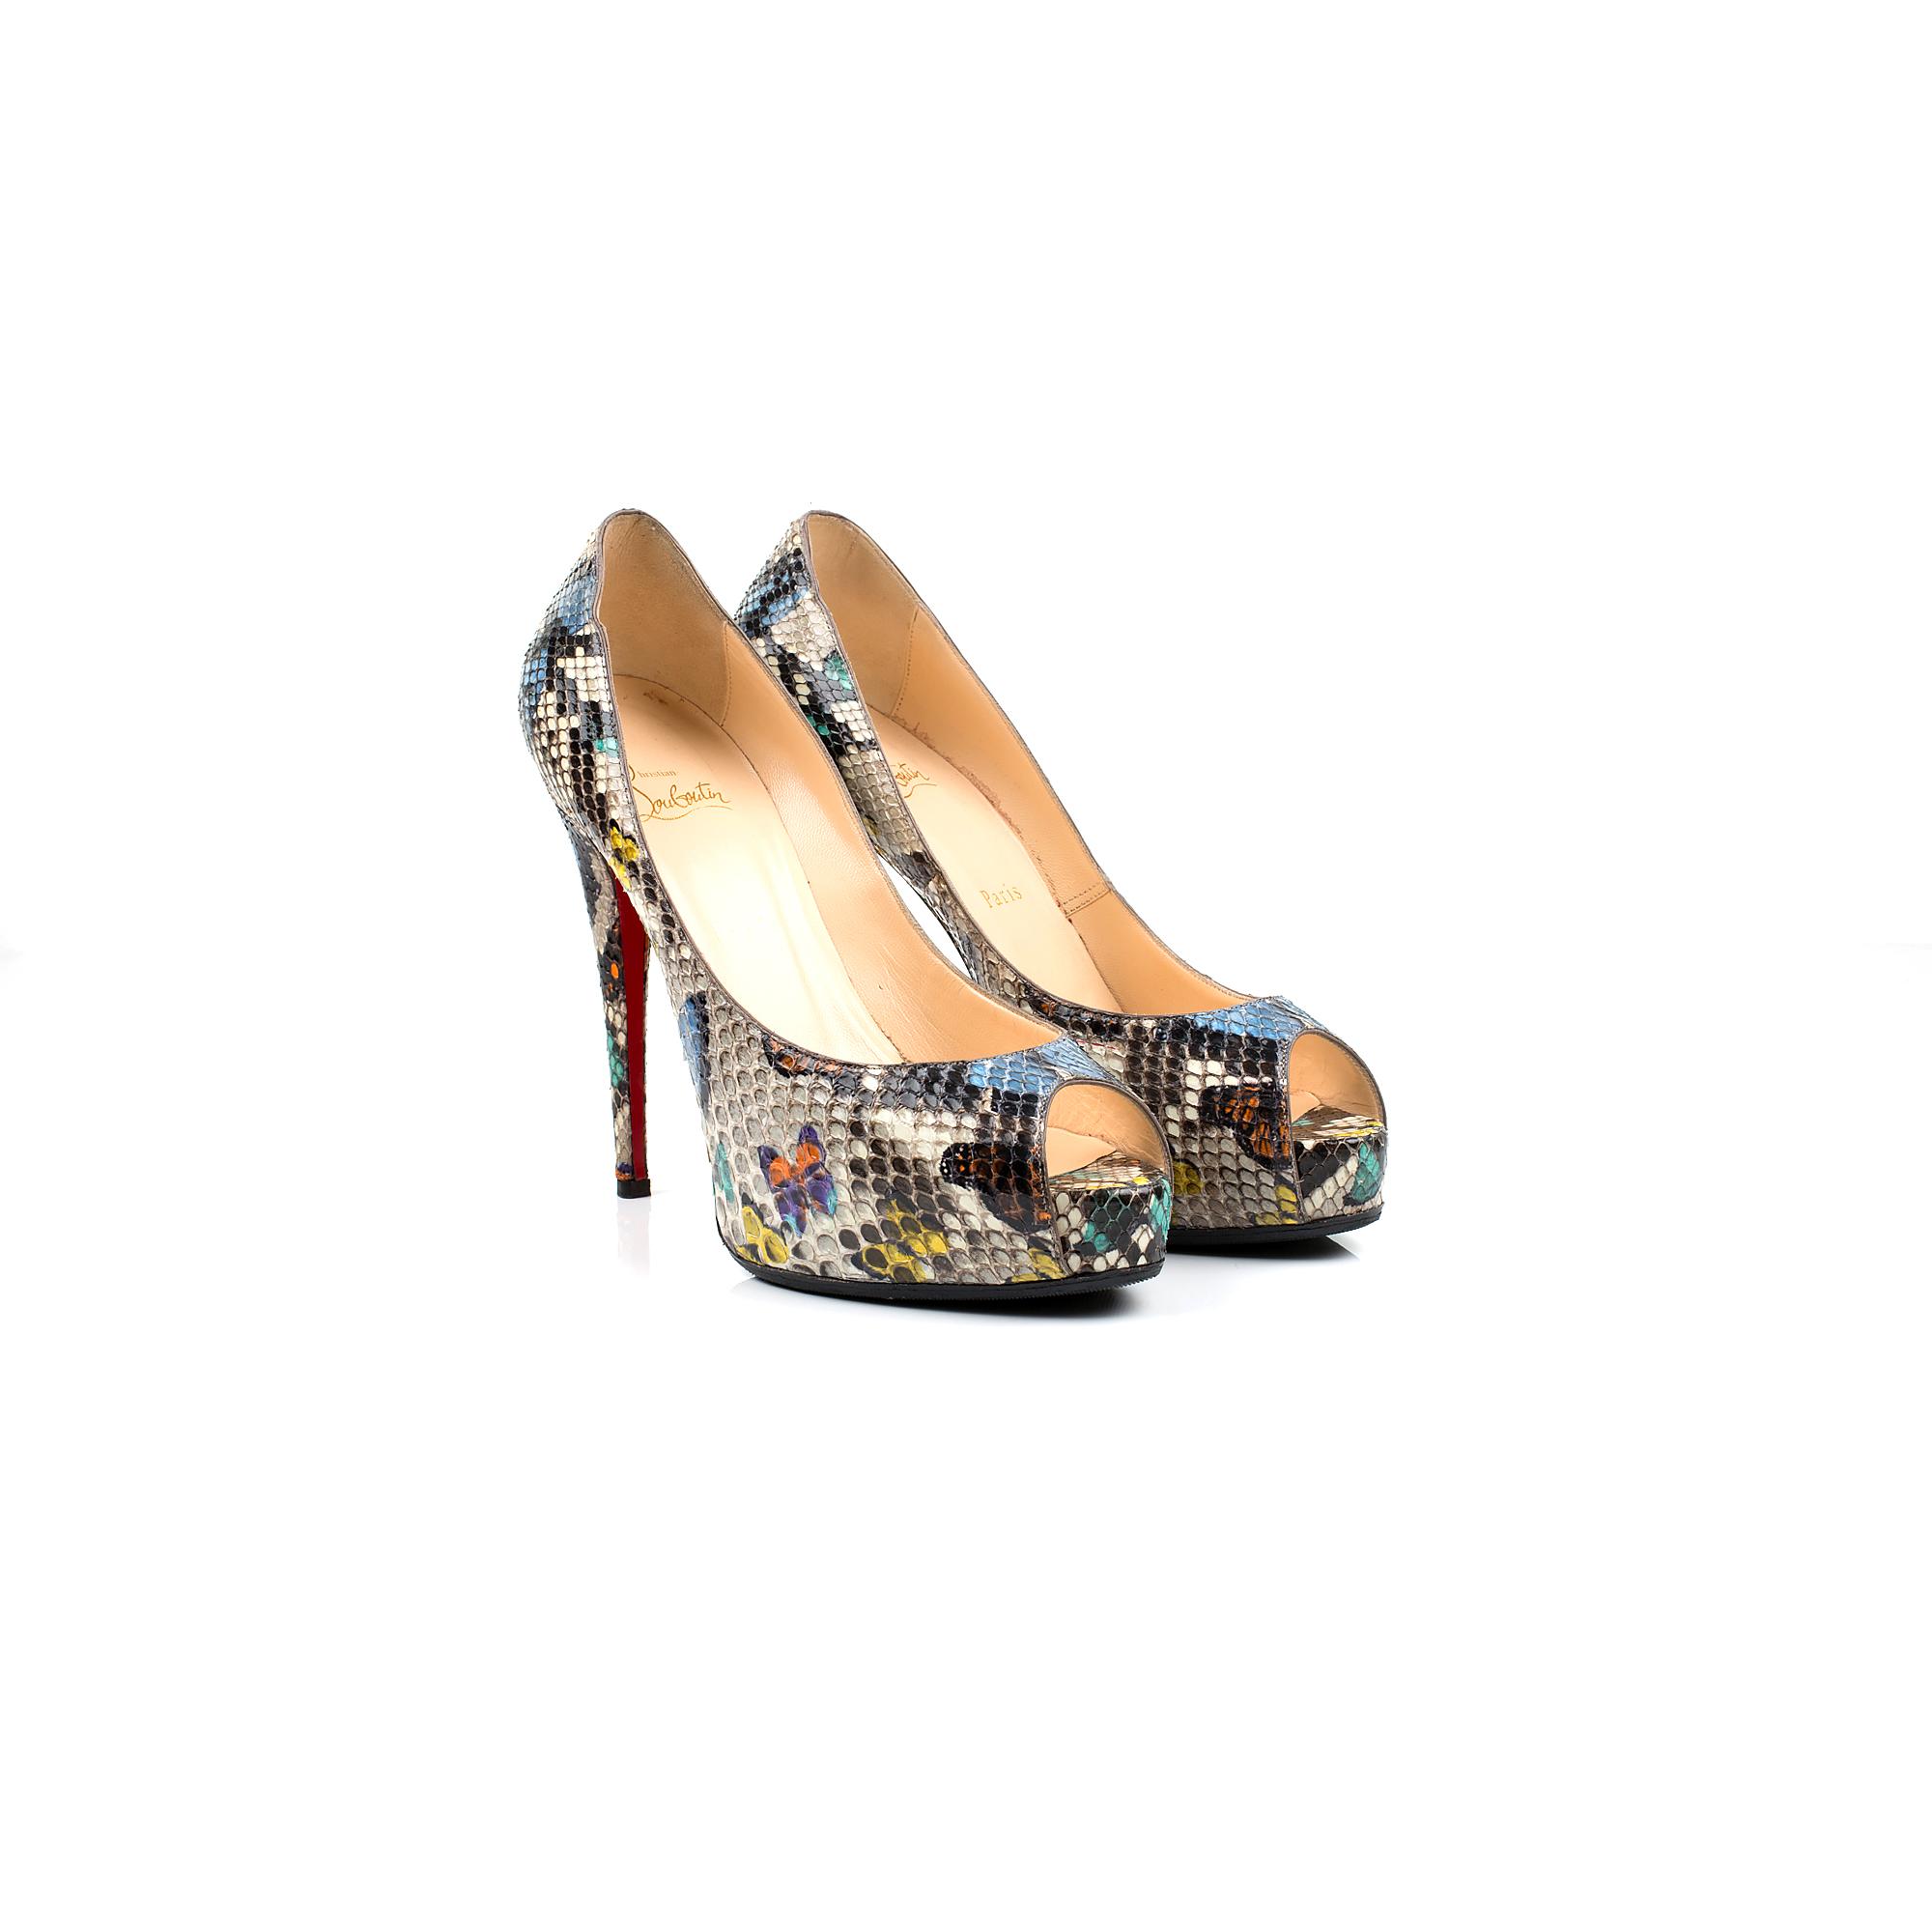 Peep Toe Python Platform Shoe by Louboutin - Le Dressing Monaco